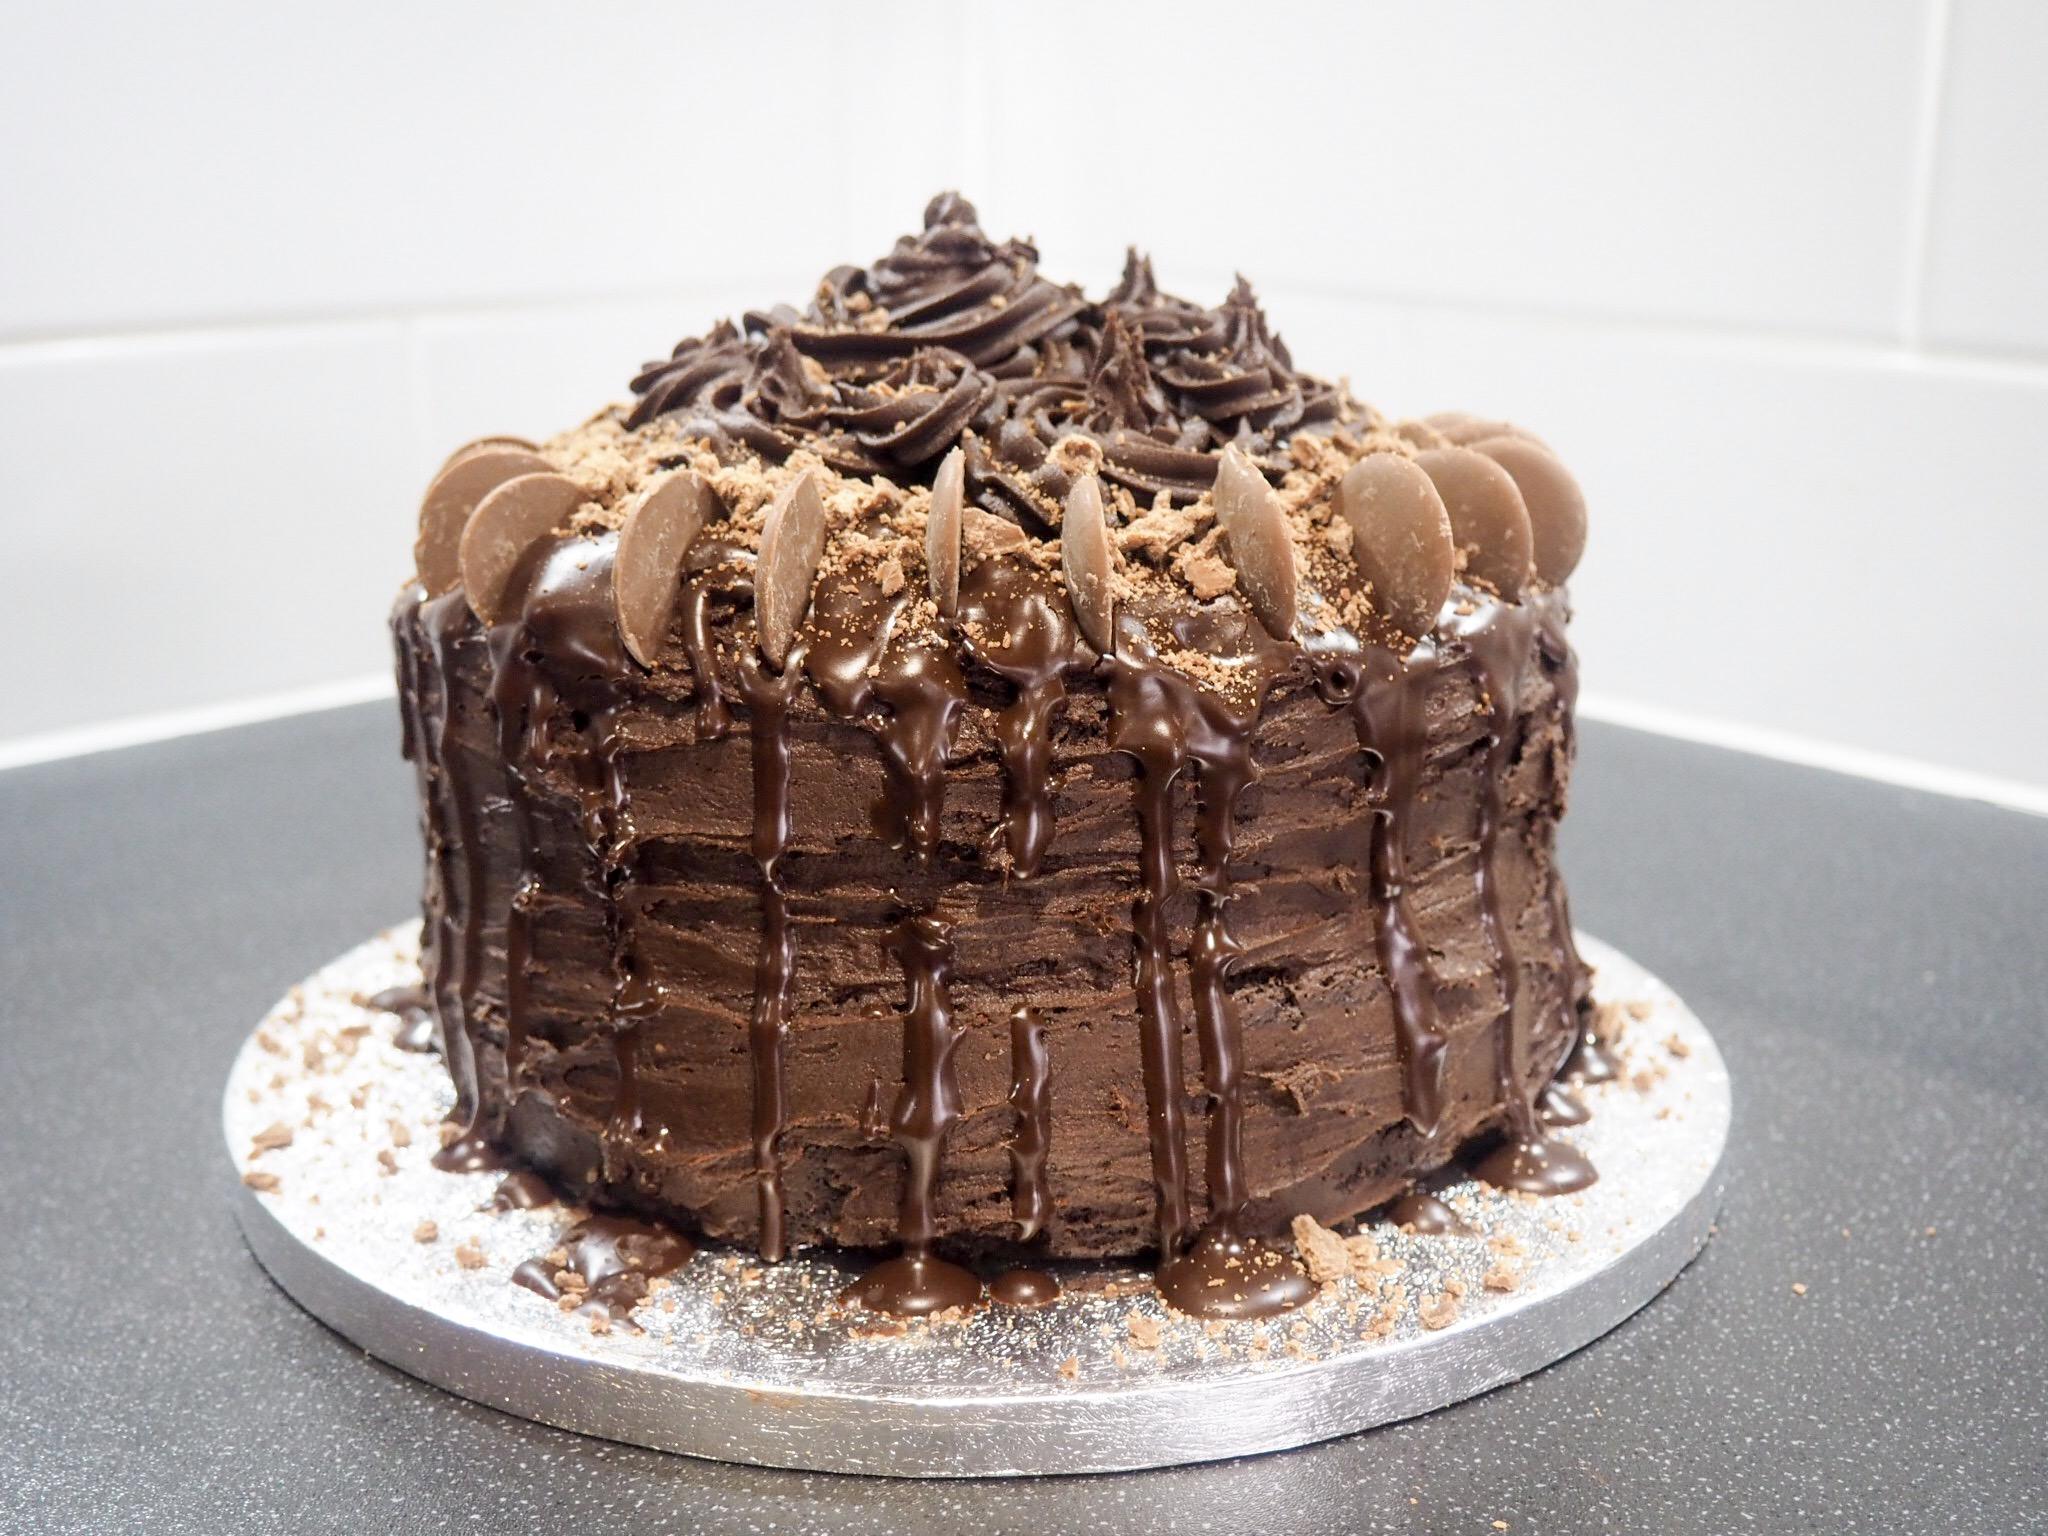 Hannatalks salted caramel chocolate cake